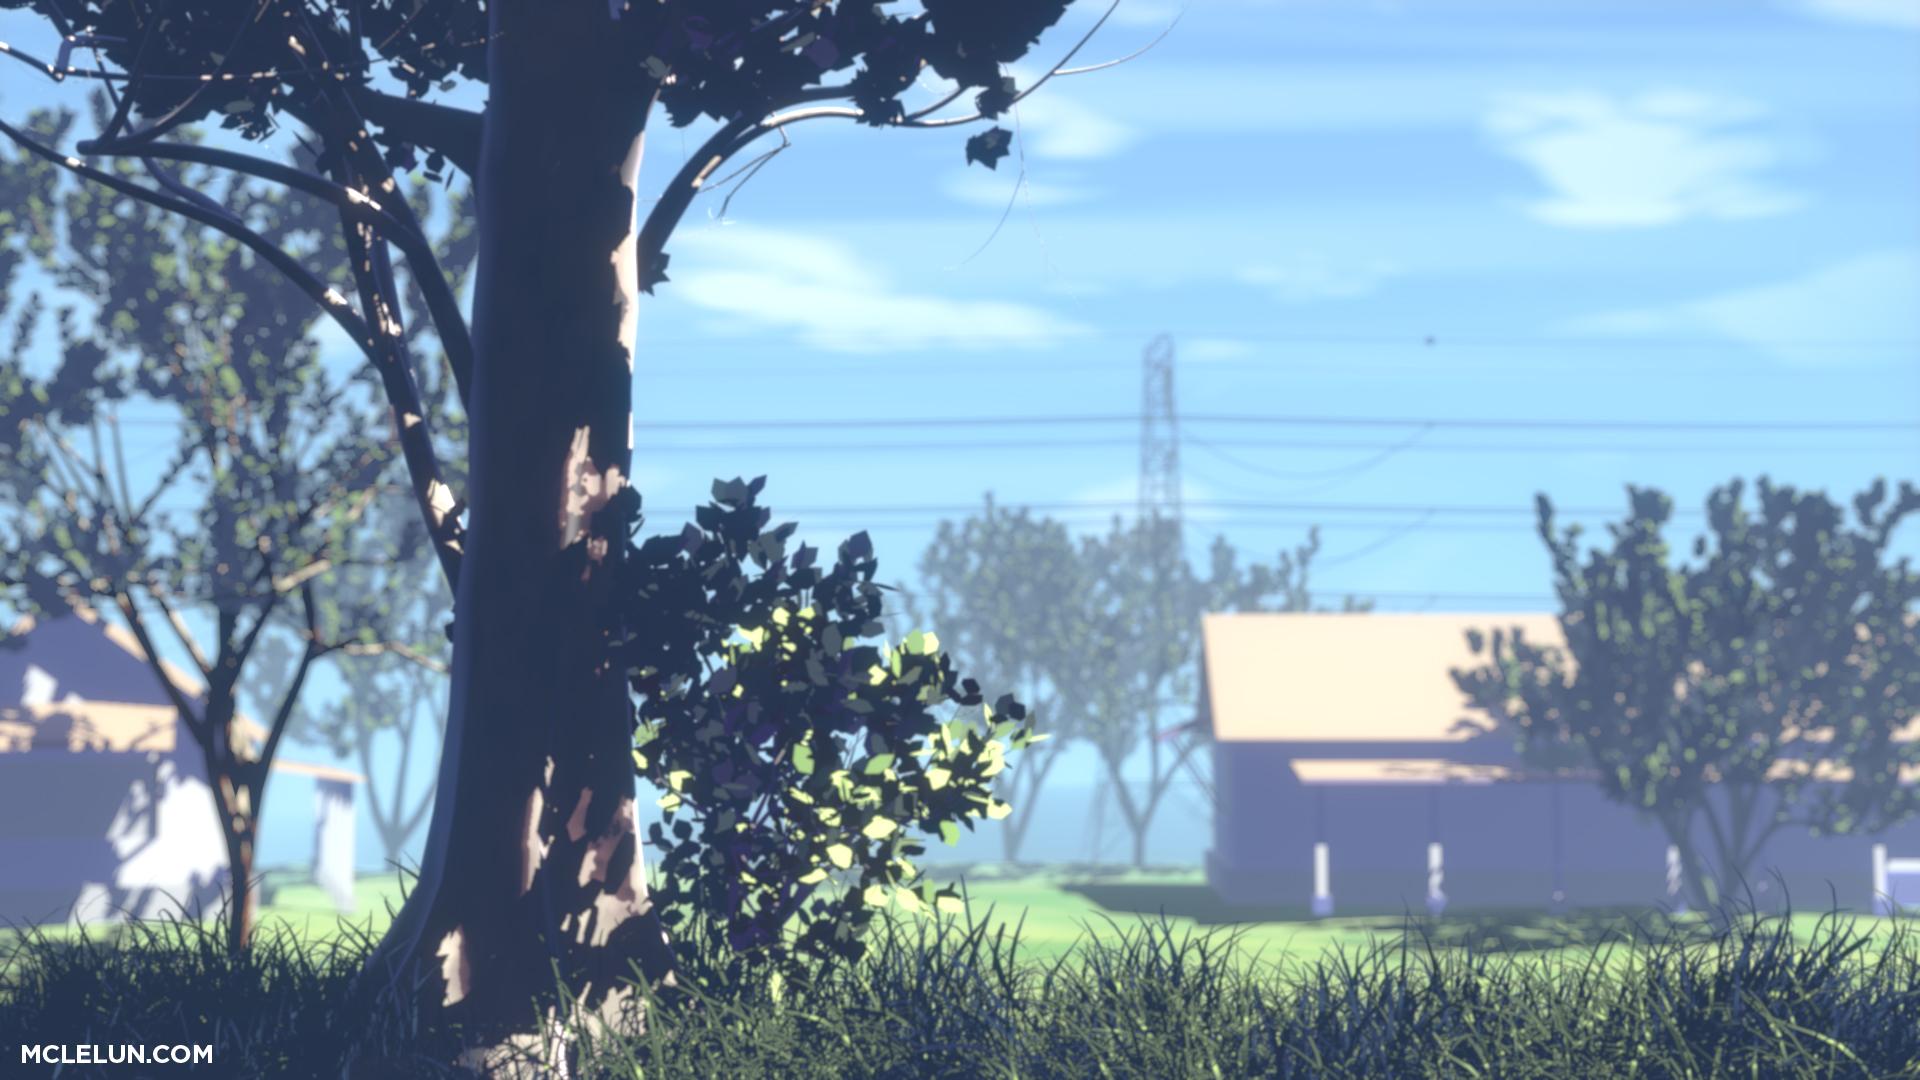 Anime Background 3d Render By Mclelun On Deviantart